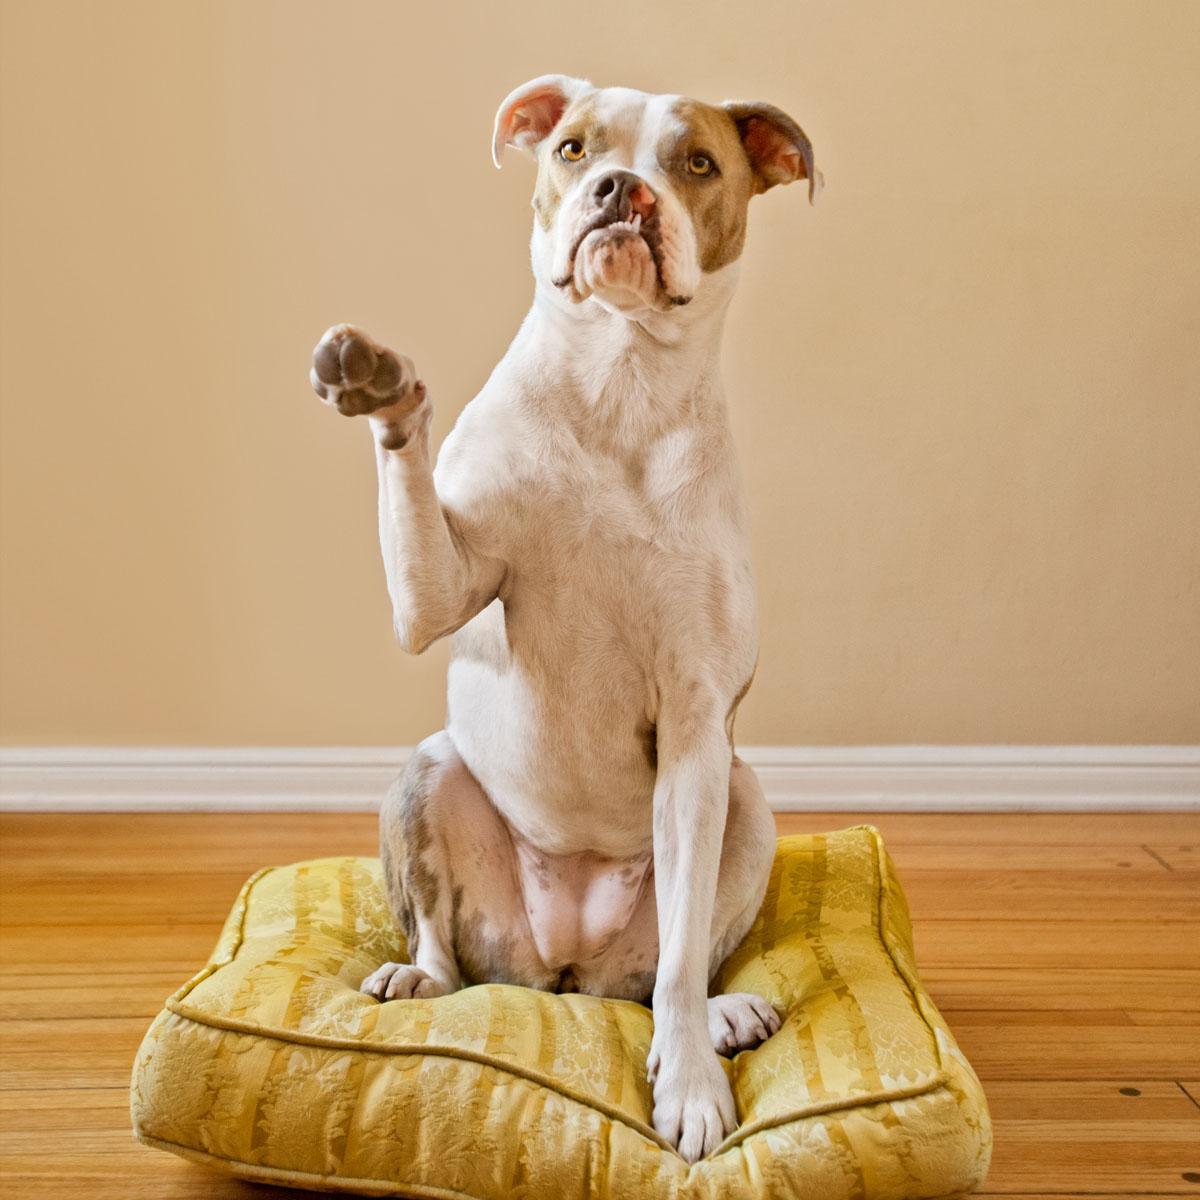 Puka the dog raises her paw